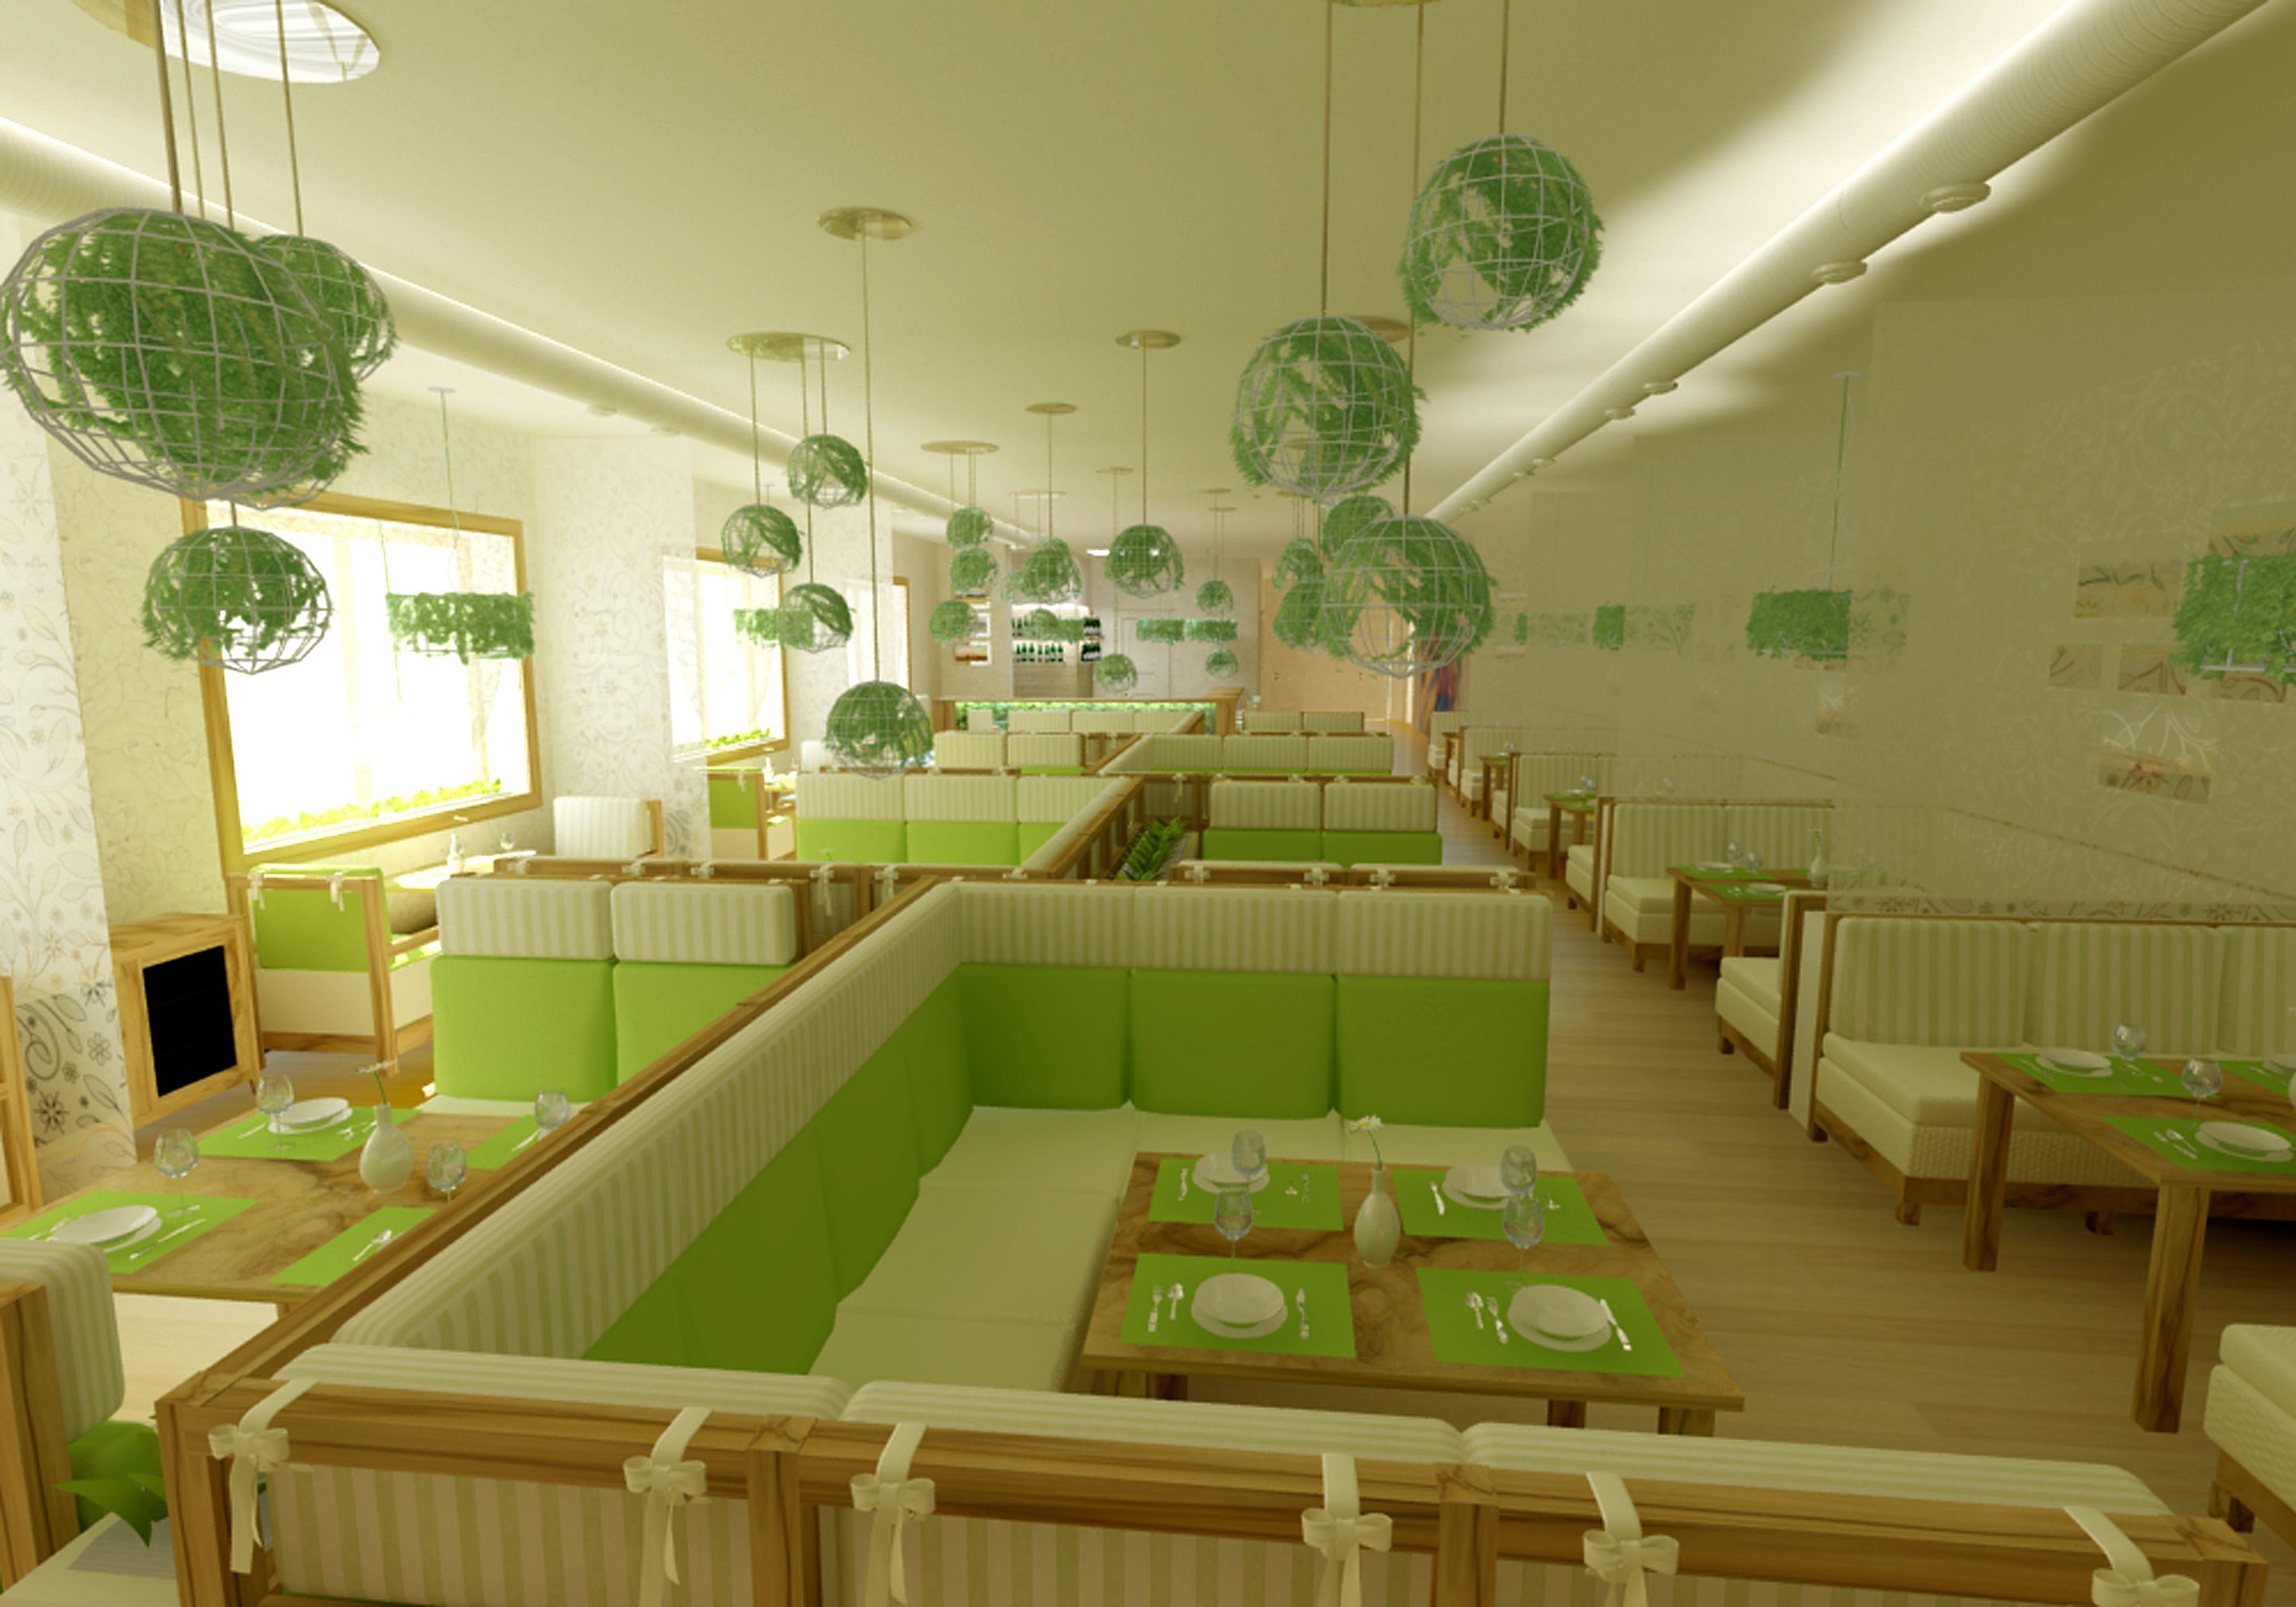 cafe interior design green google search cafe decor pinterest cafe interior design and interiors